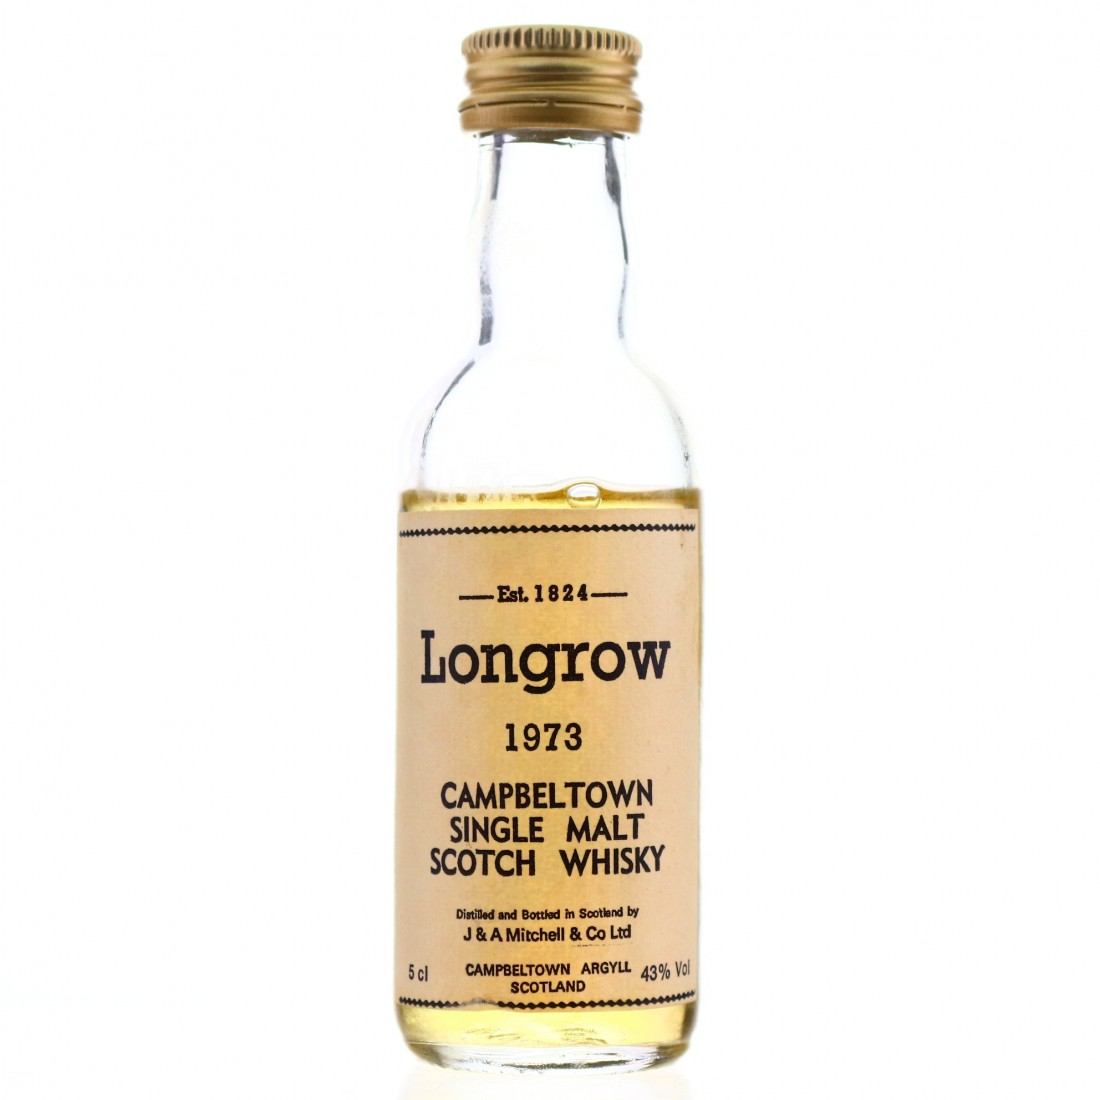 Longrow 1973 Miniature